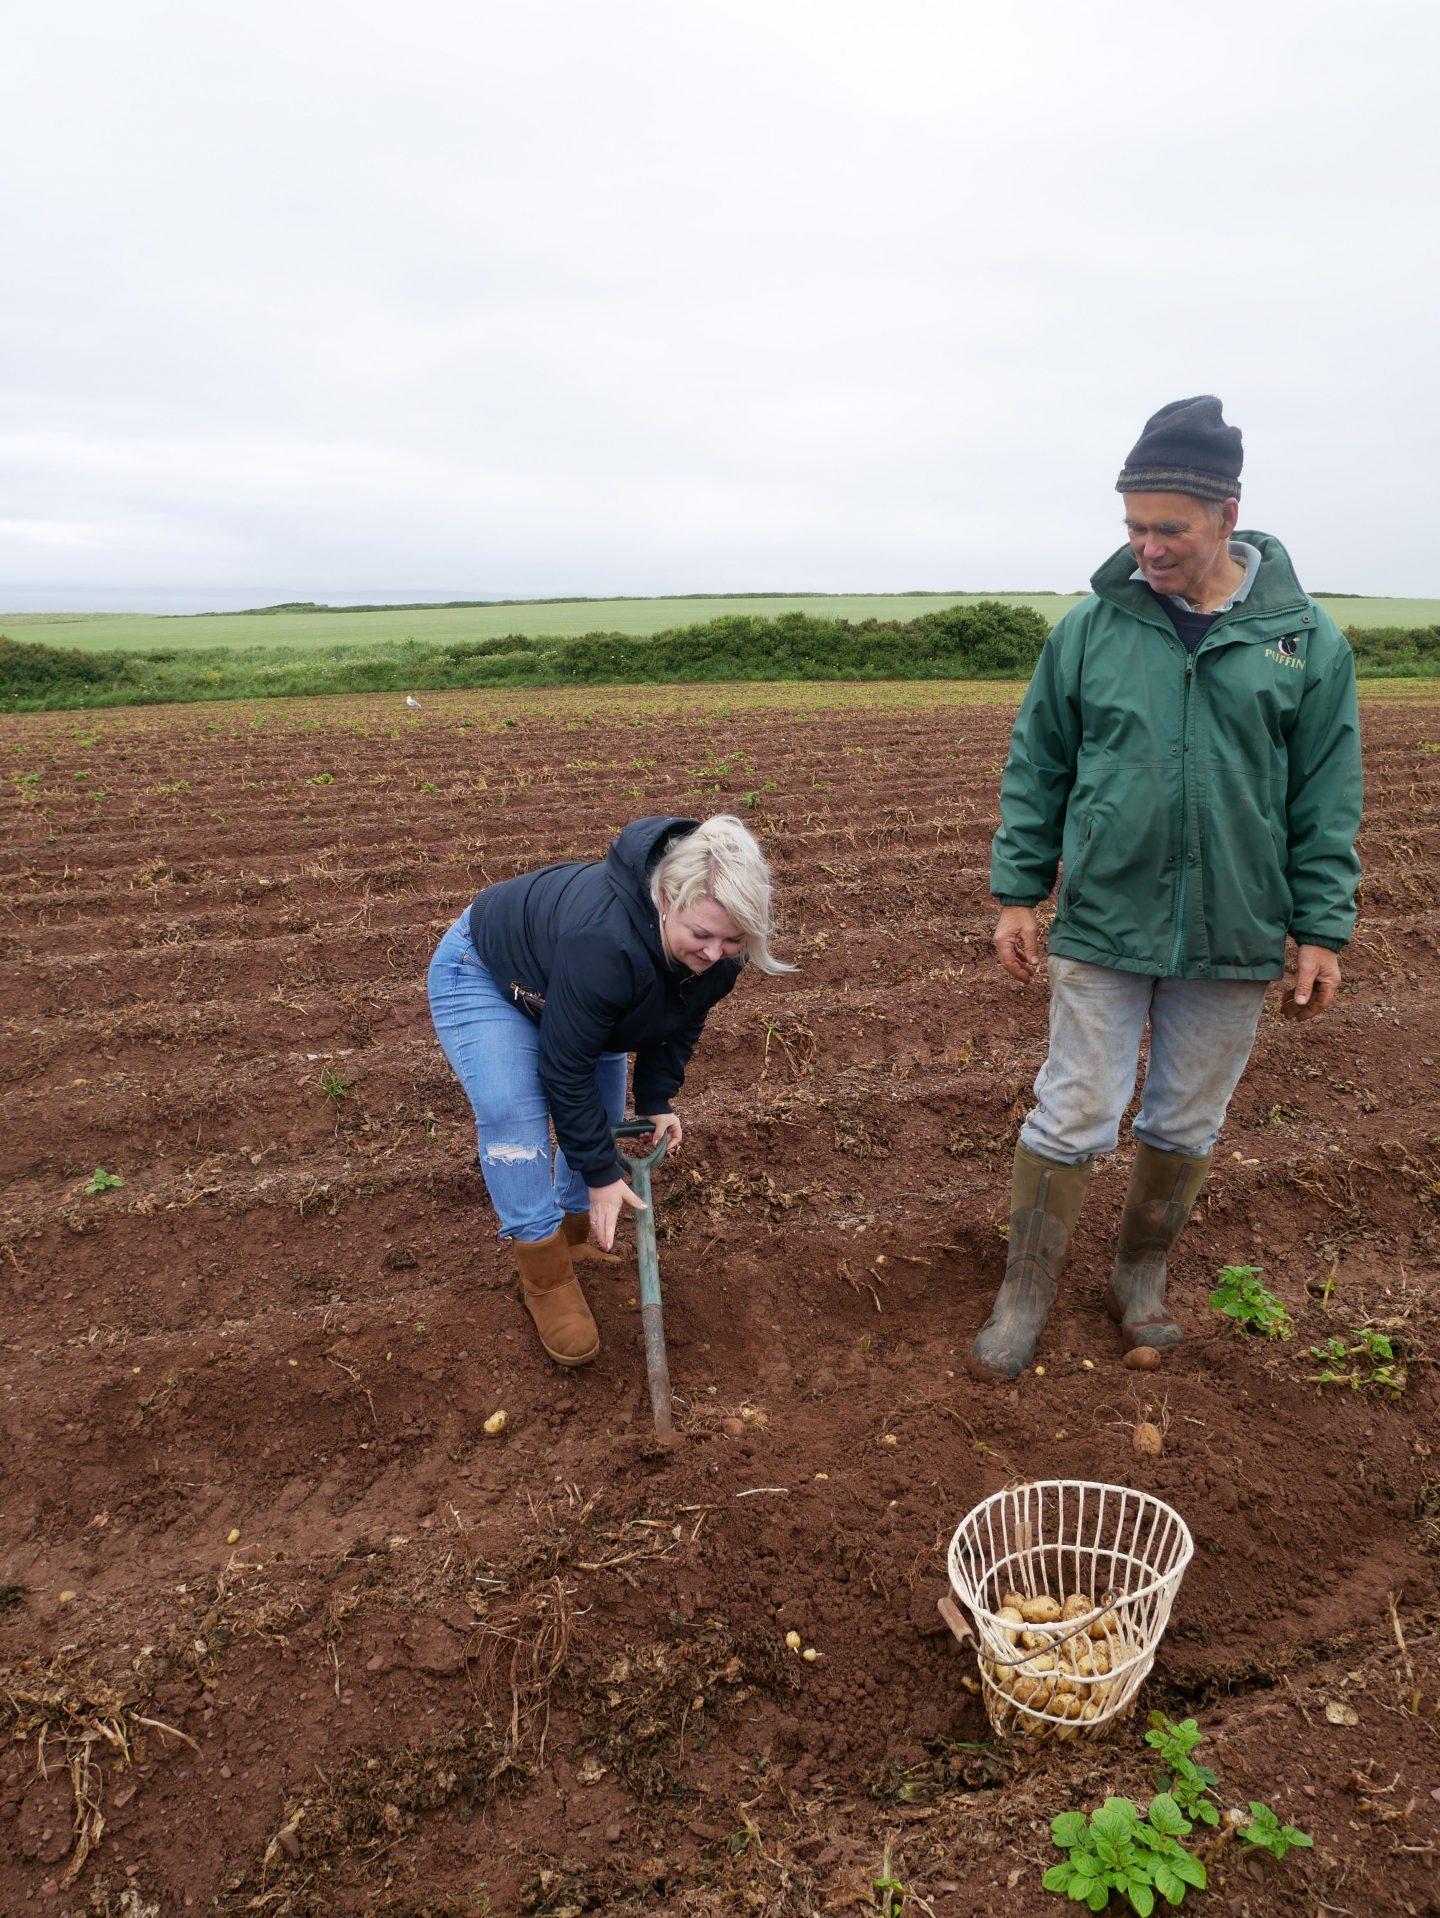 Digging up Pembrokeshire Early potatoes at Windmill Farm